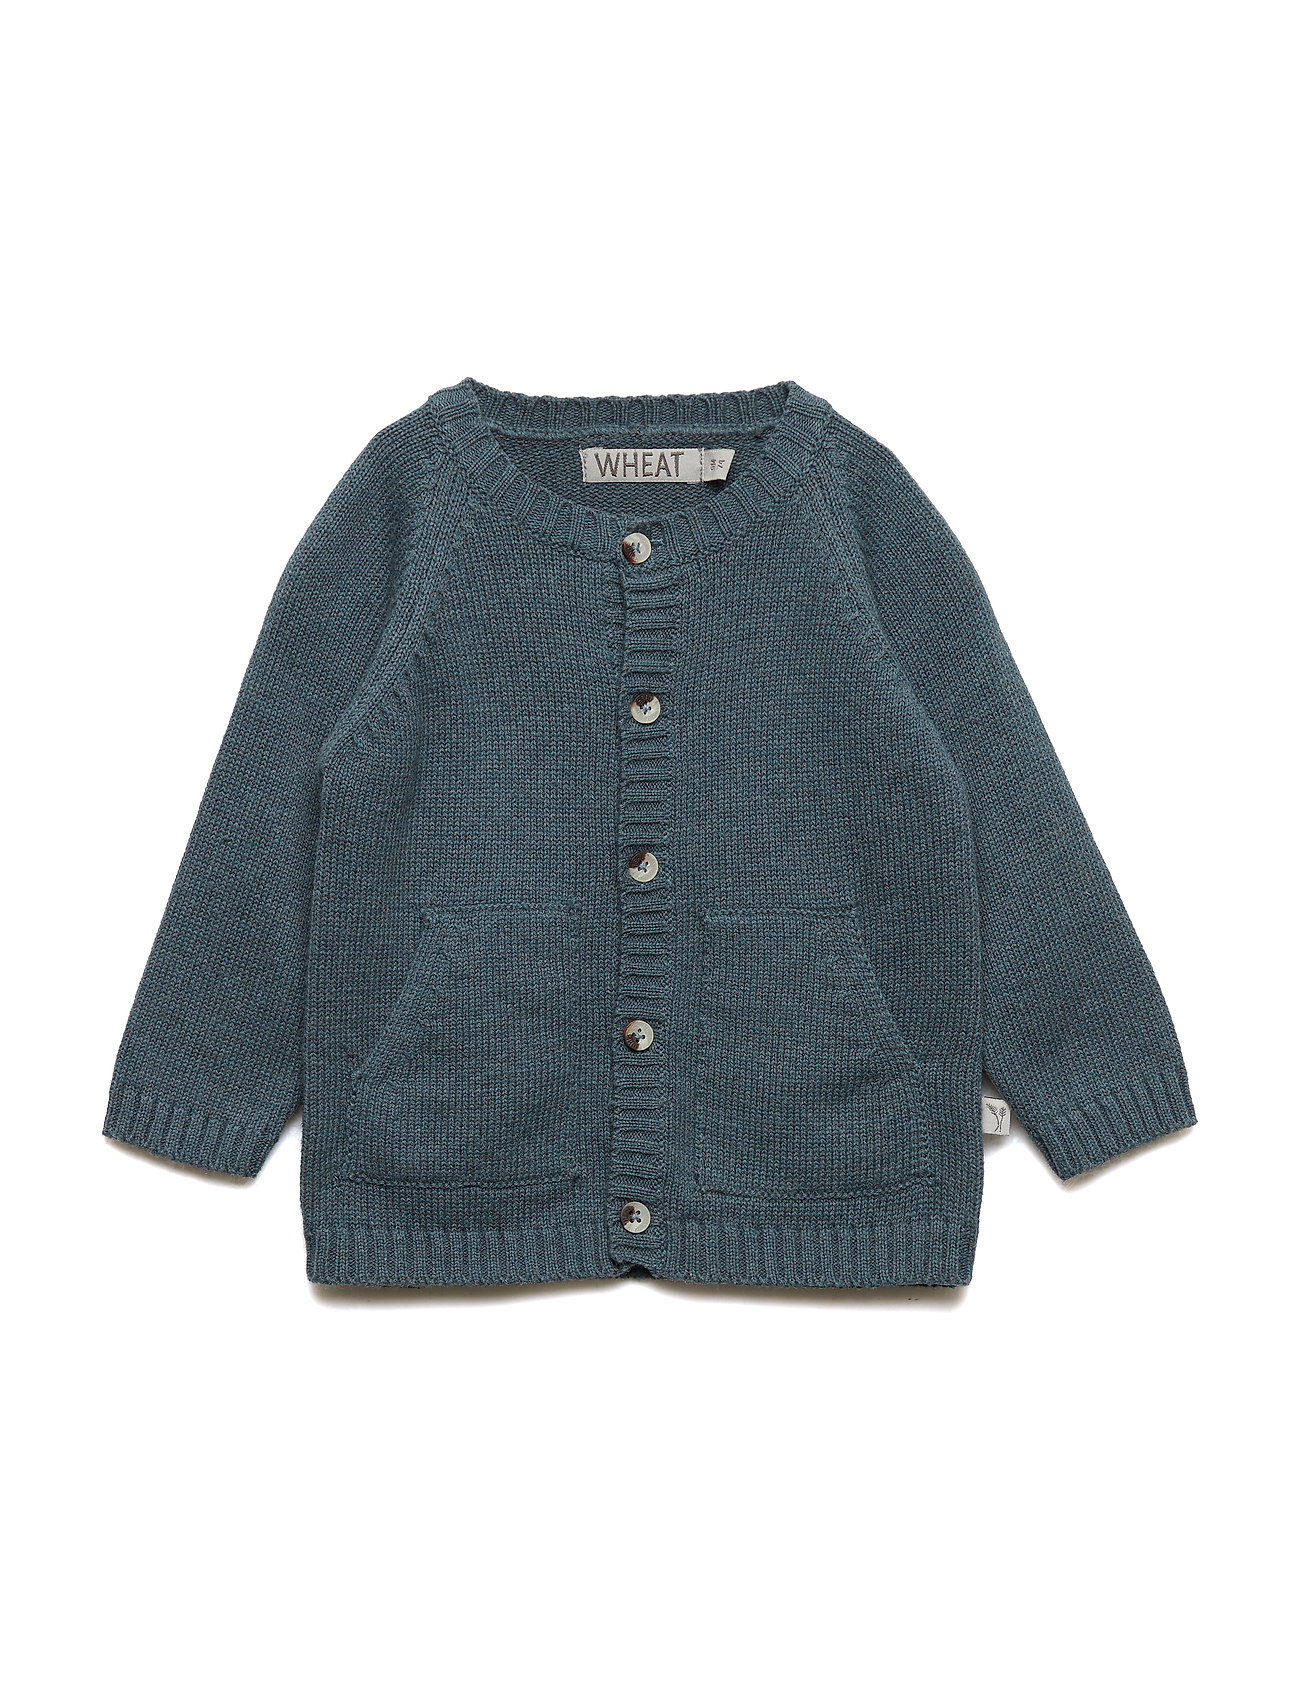 Wheat Knit Cardigan Classic - STORMY MELANGE